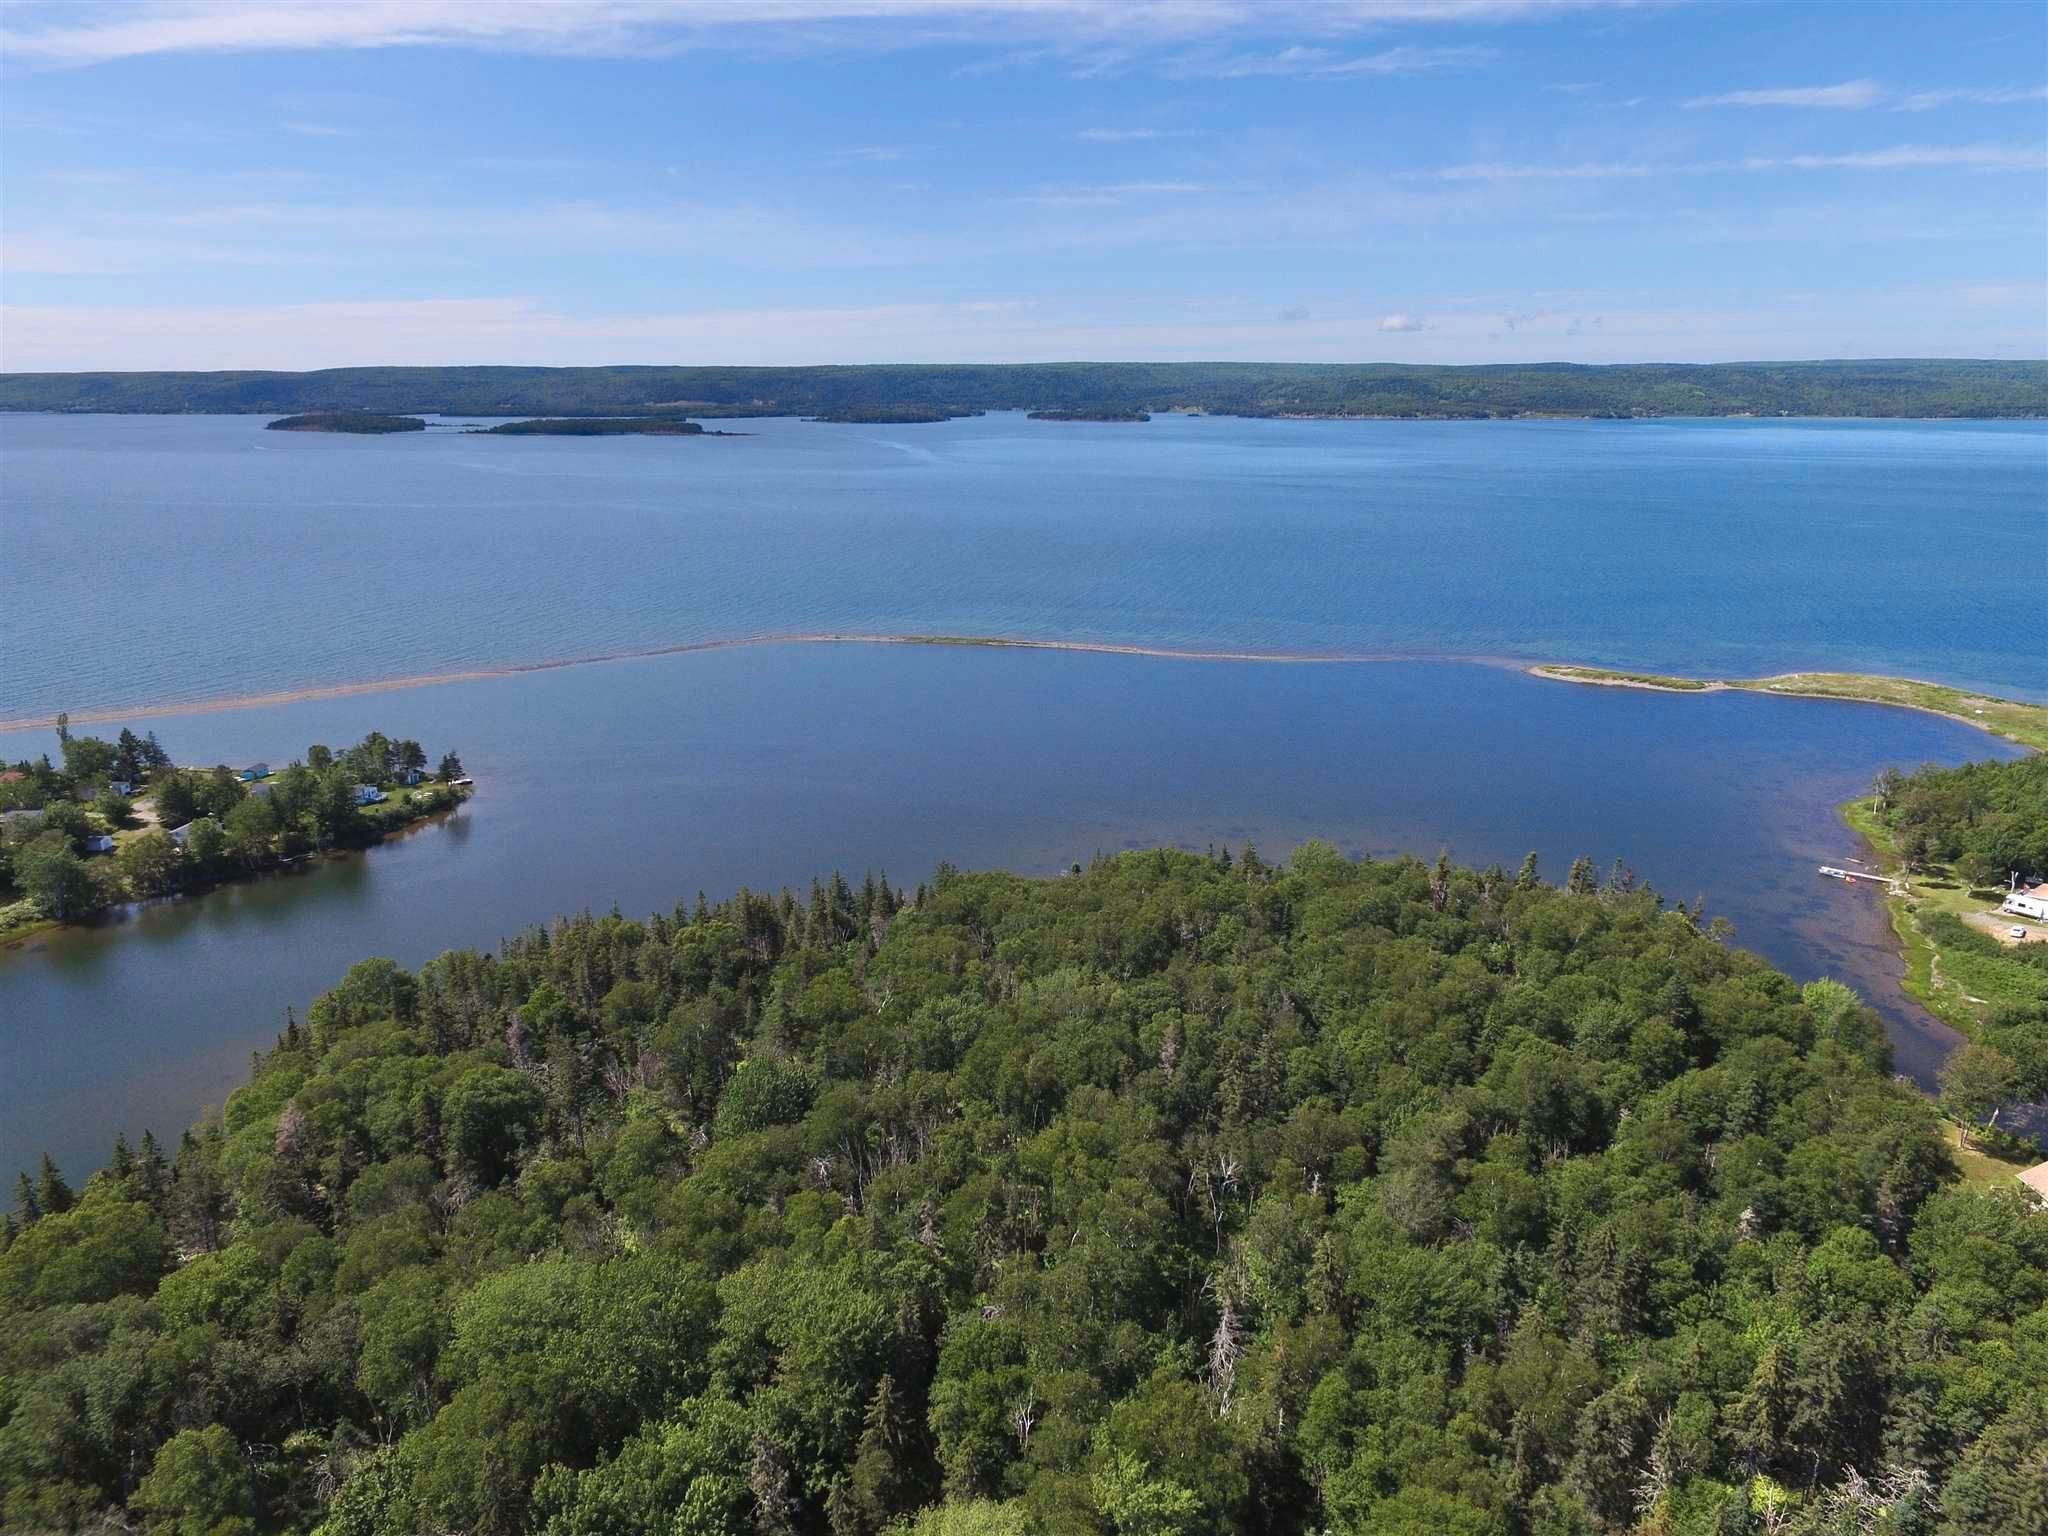 Main Photo: 40 Glen Albert Drive in Big Pond: 207-C. B. County Vacant Land for sale (Cape Breton)  : MLS®# 202118765